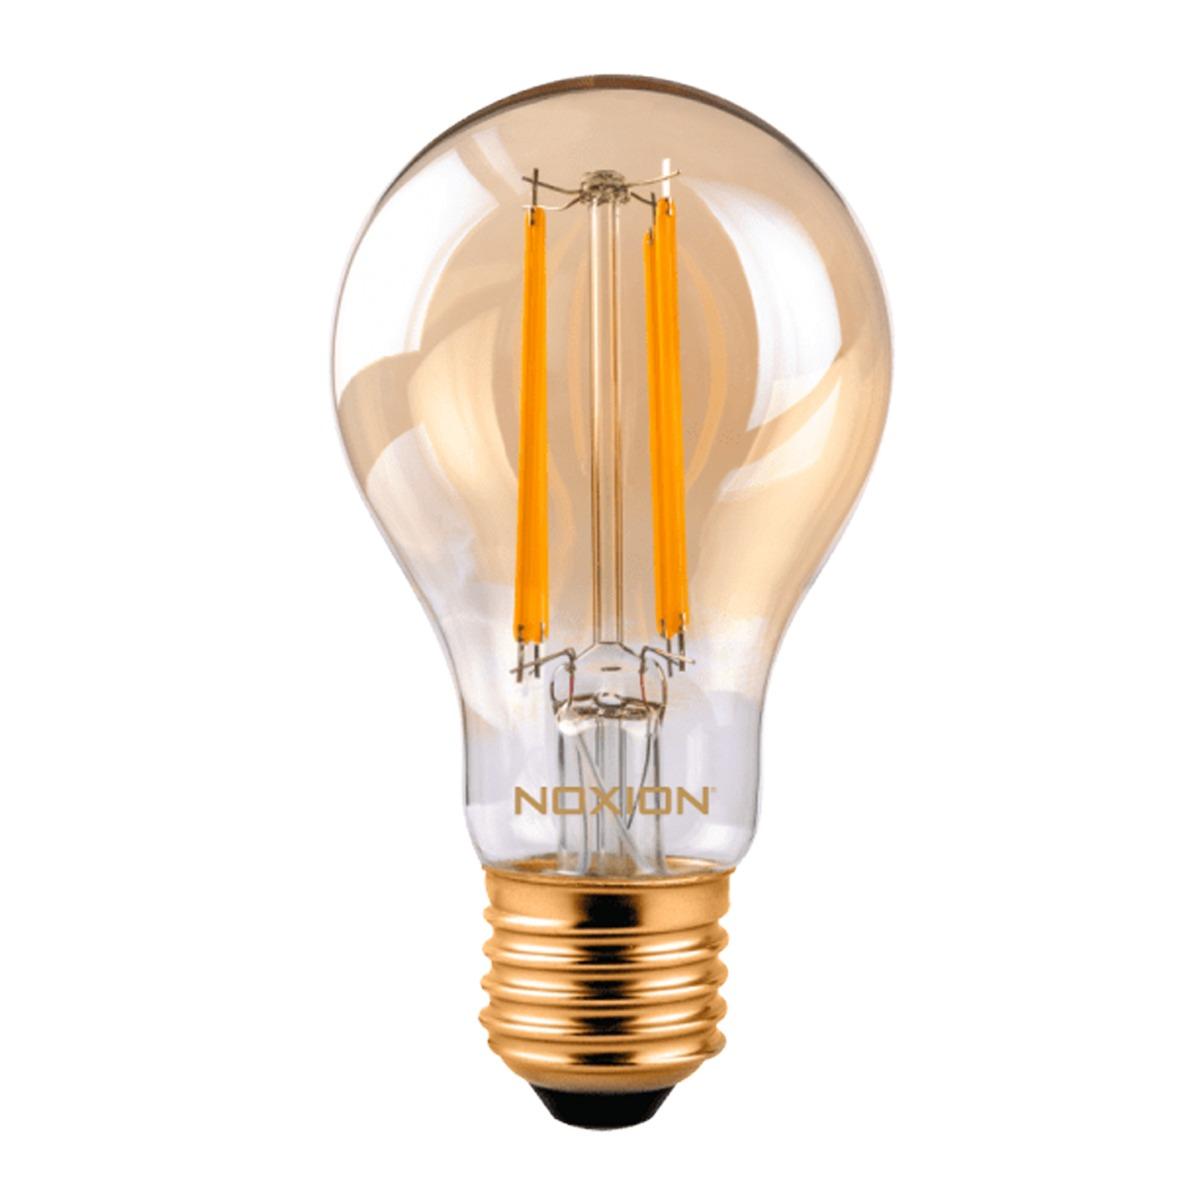 Noxion Lucent Classic LED Filament A60 E27 8W 822 Helder | Dimbaar - Zeer Warm Wit - Vervangt 50W